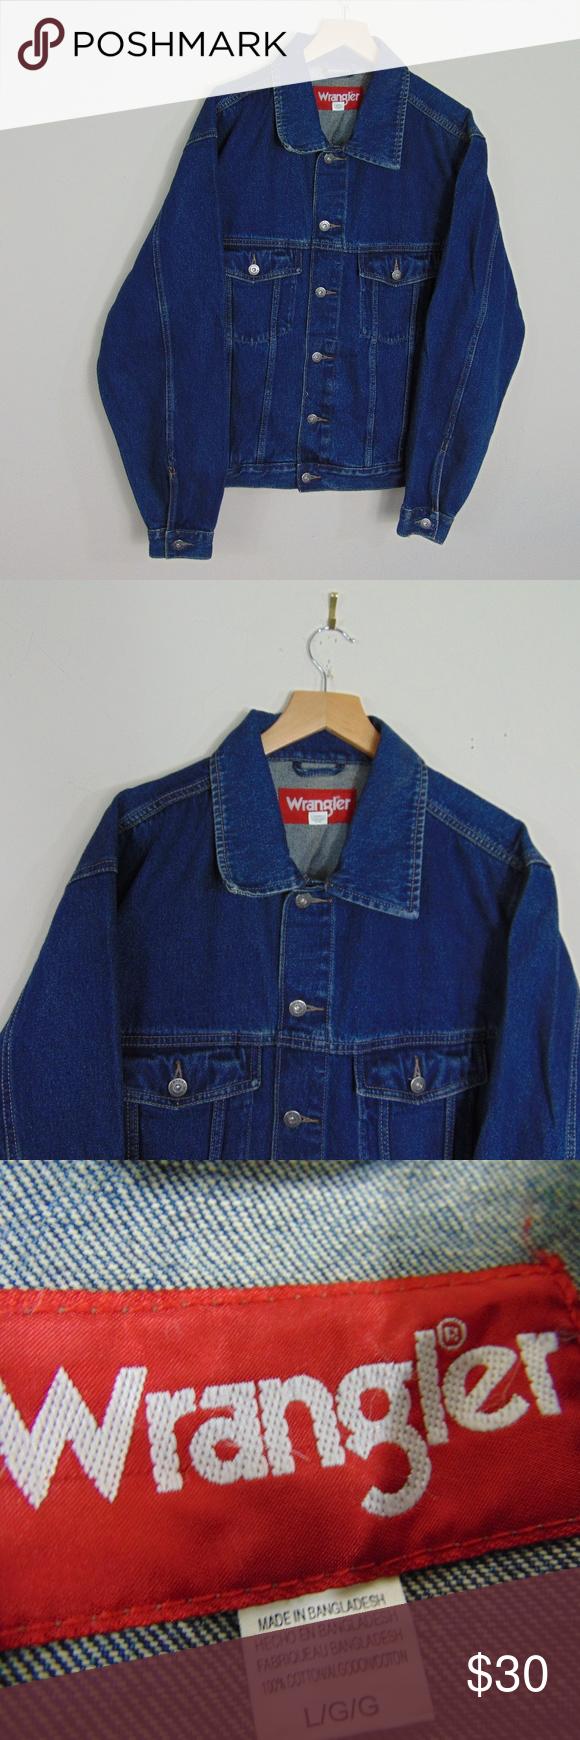 Vintage Wrangler Men L Denim Jean Trucker Jacket Vintage Wrangler Denim Jeans Washed Denim Jeans [ 1740 x 580 Pixel ]